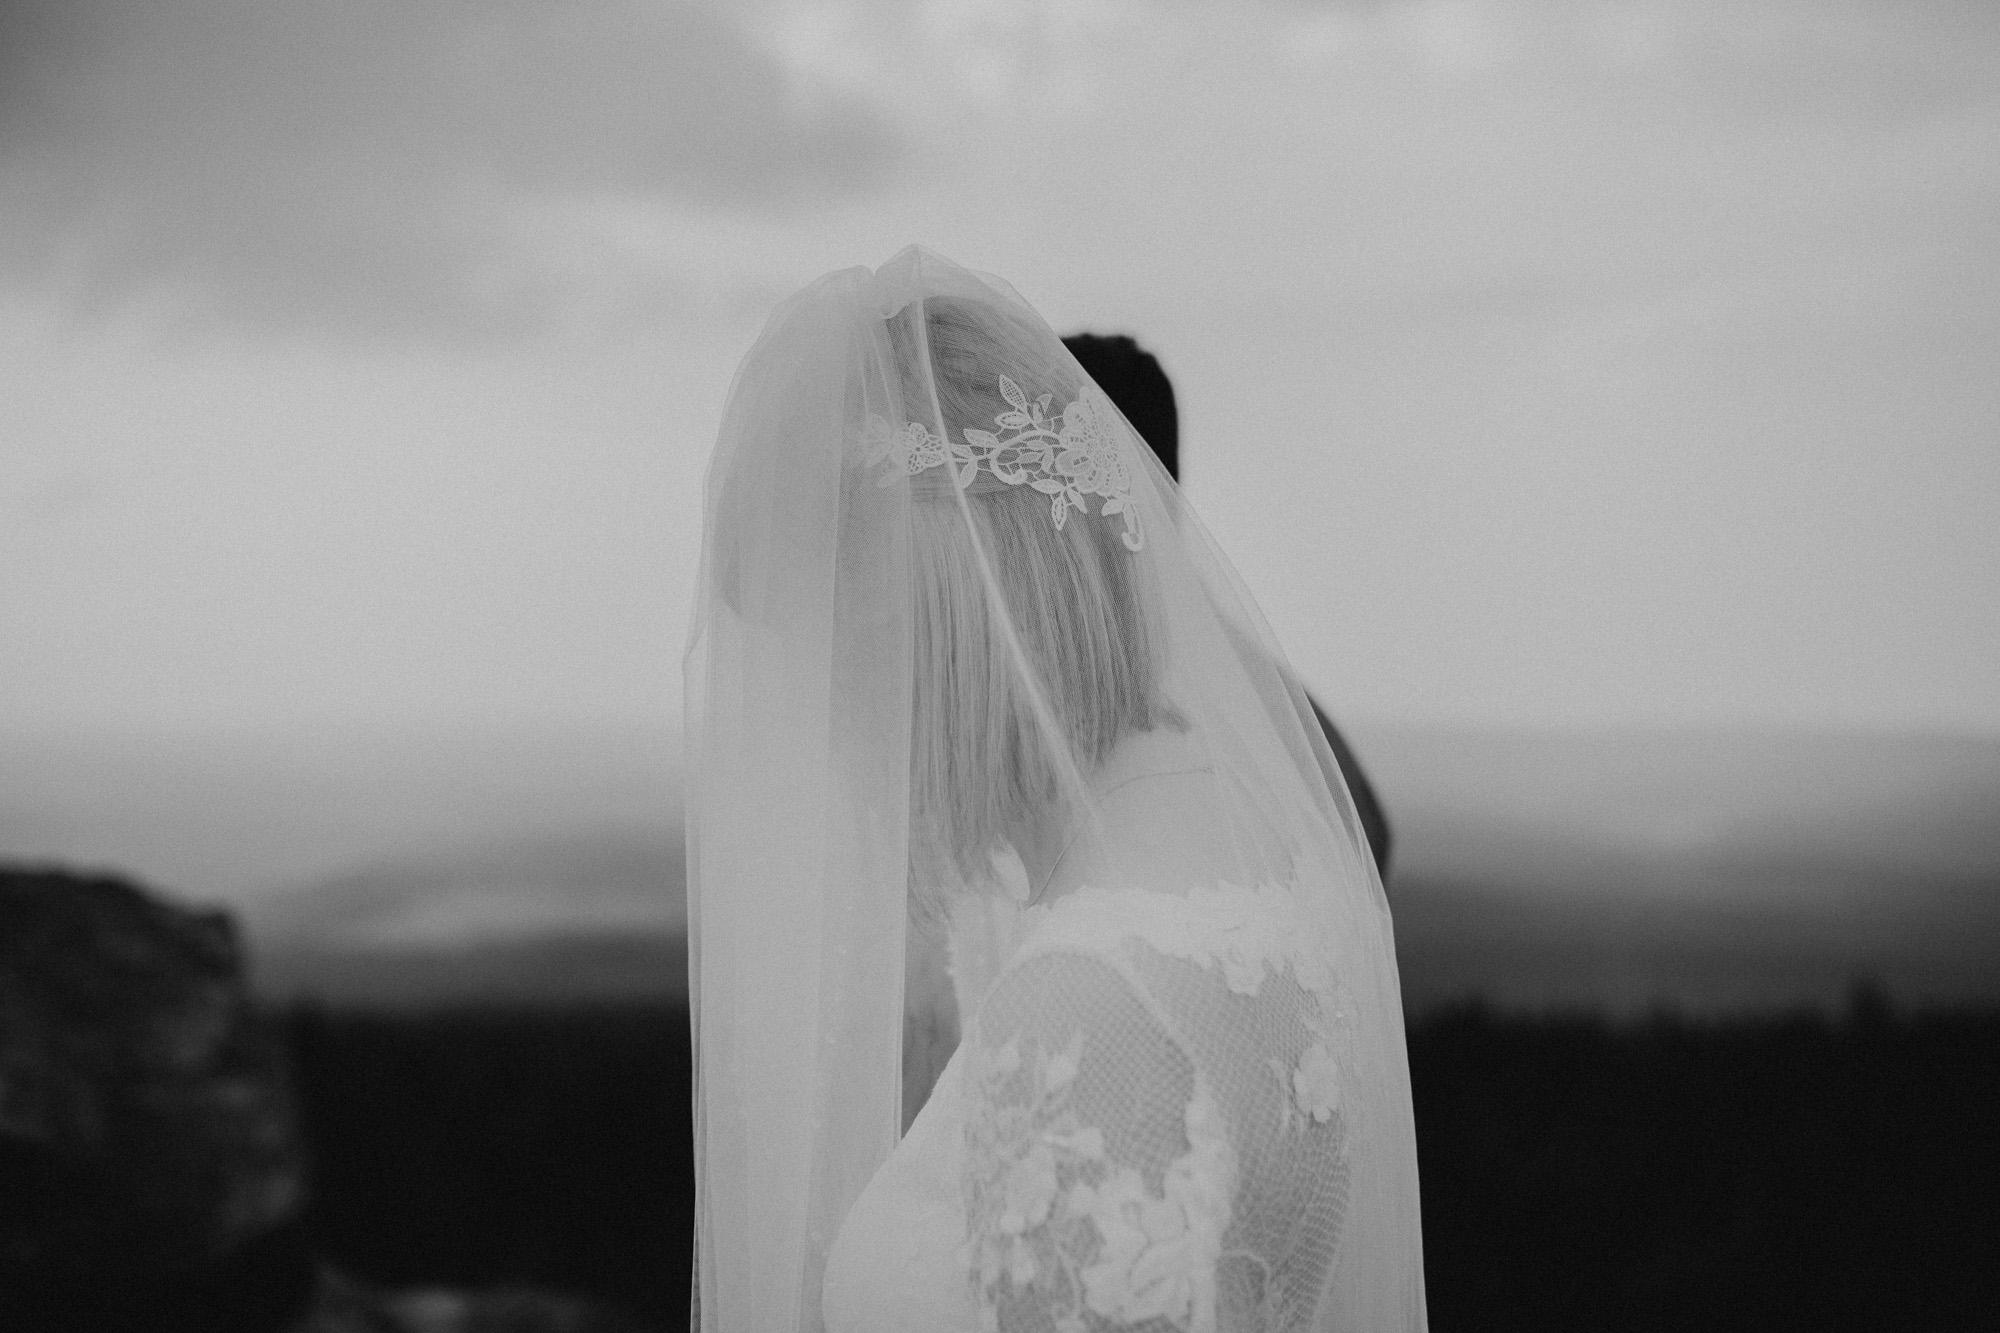 DanielaMarquardtPhotography_Hochzeitsfotograf_Düsseldorf_Köln_Mallorca_Bayern_Austria_Harz_LinaundMaik_Afterwedding-Shooting_Weddingphotographer_Ibiza_Tuskany_Italien_Toskana2